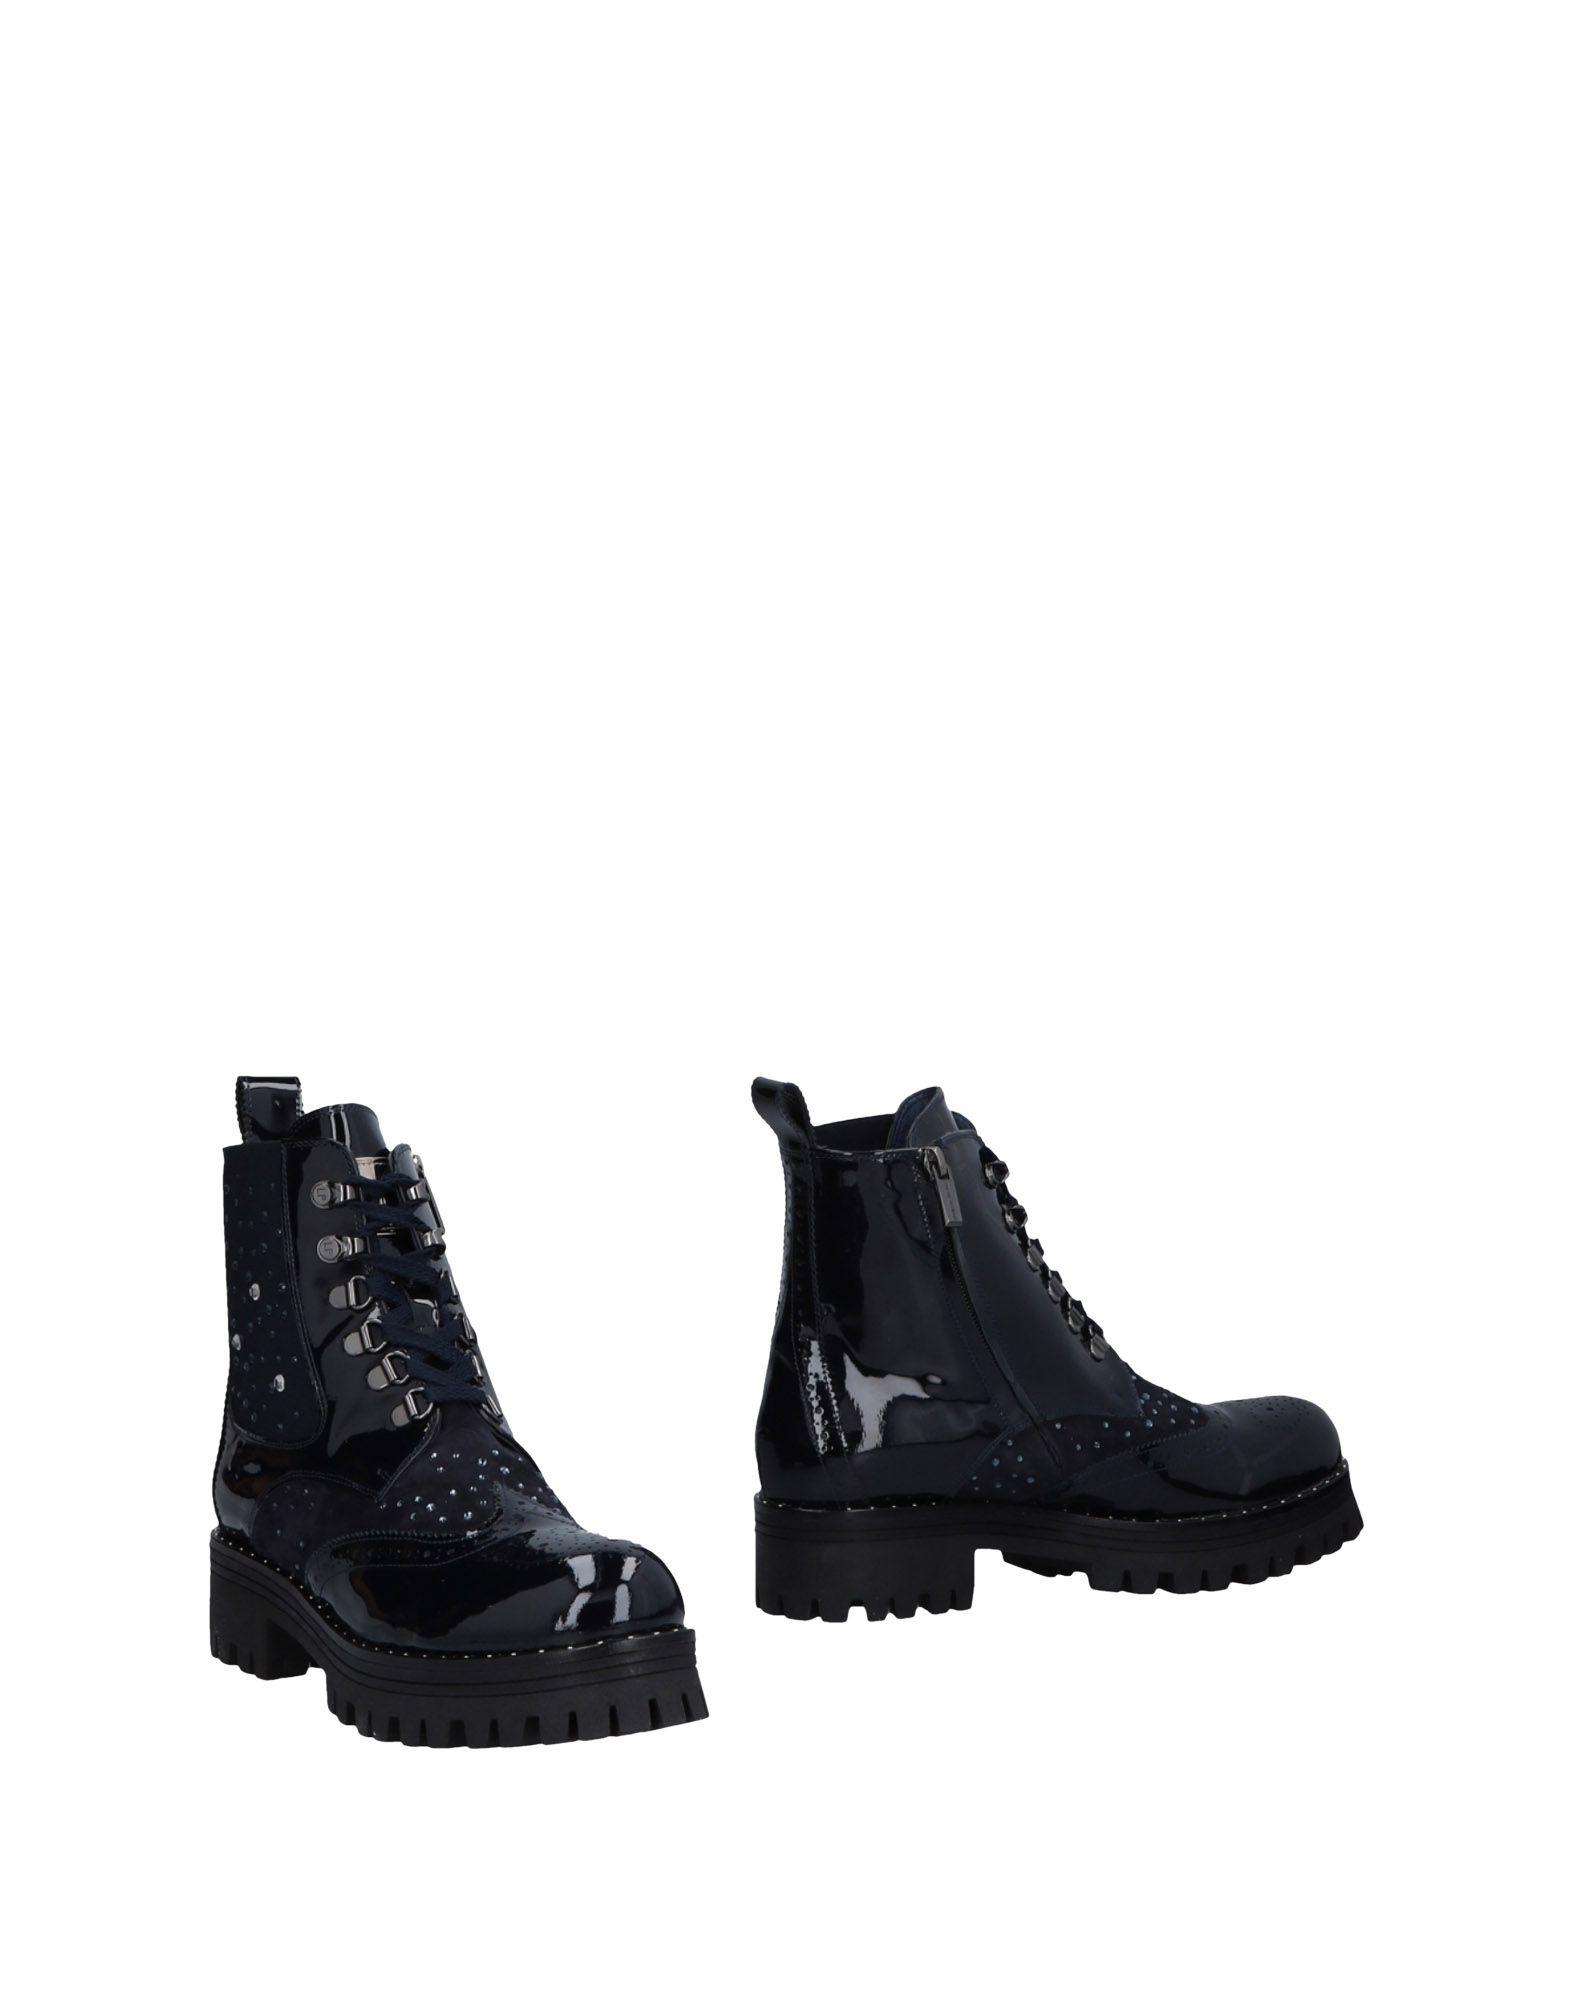 Rabatt Schuhe Stiefelette Loretta Pettinari Stiefelette Schuhe Damen  11476893JE f207ab